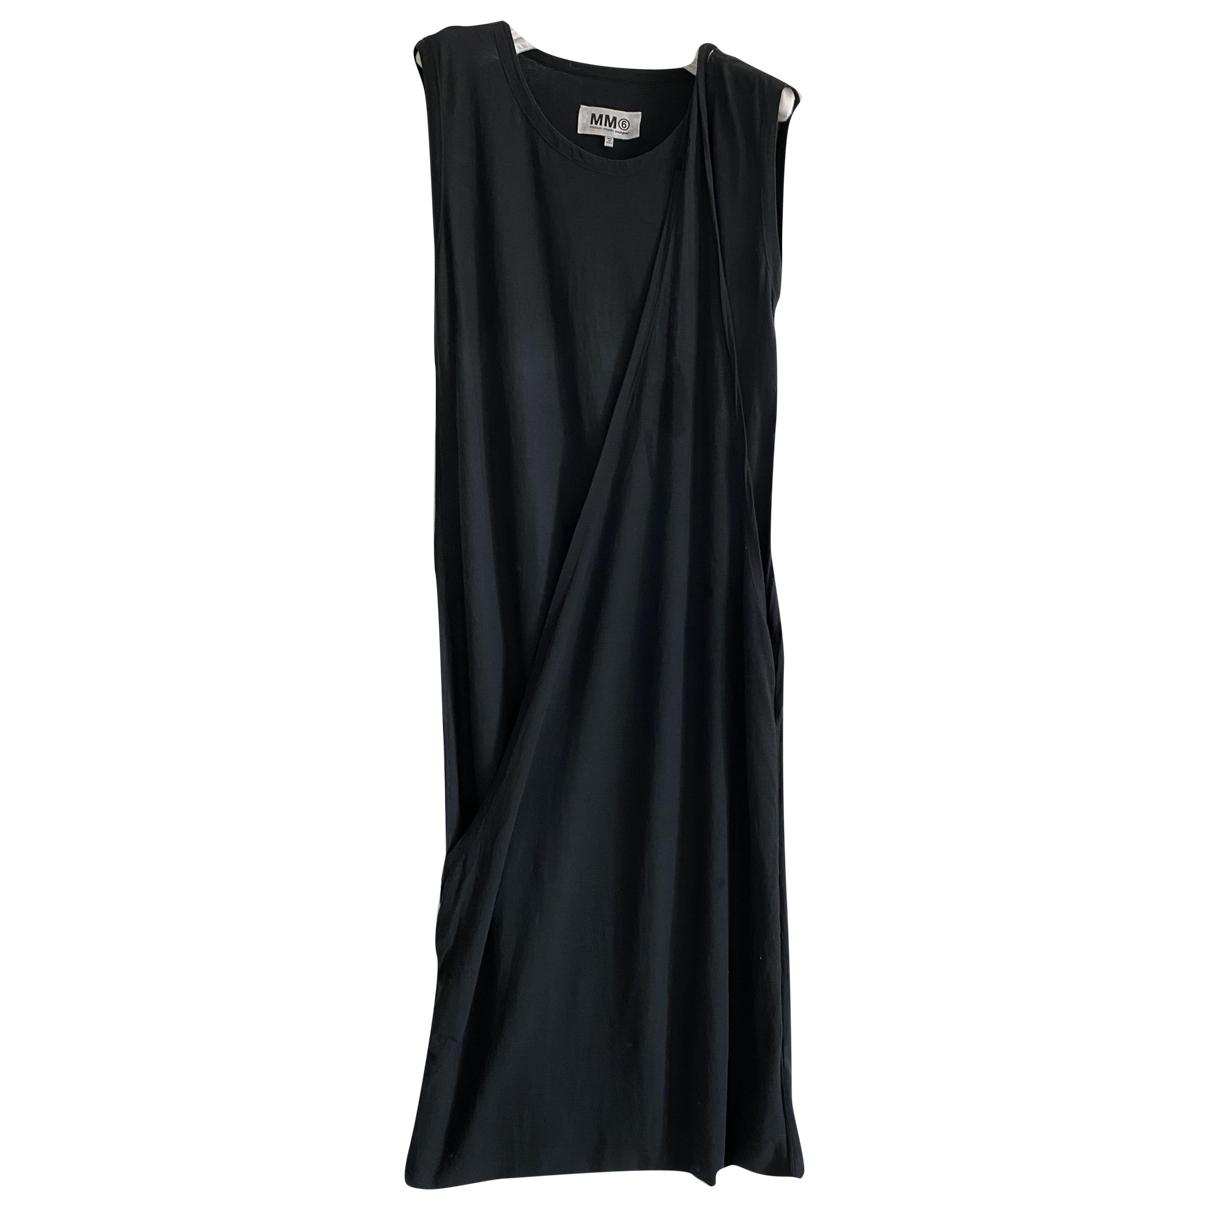 Mm6 \N Kleid in  Schwarz Baumwolle